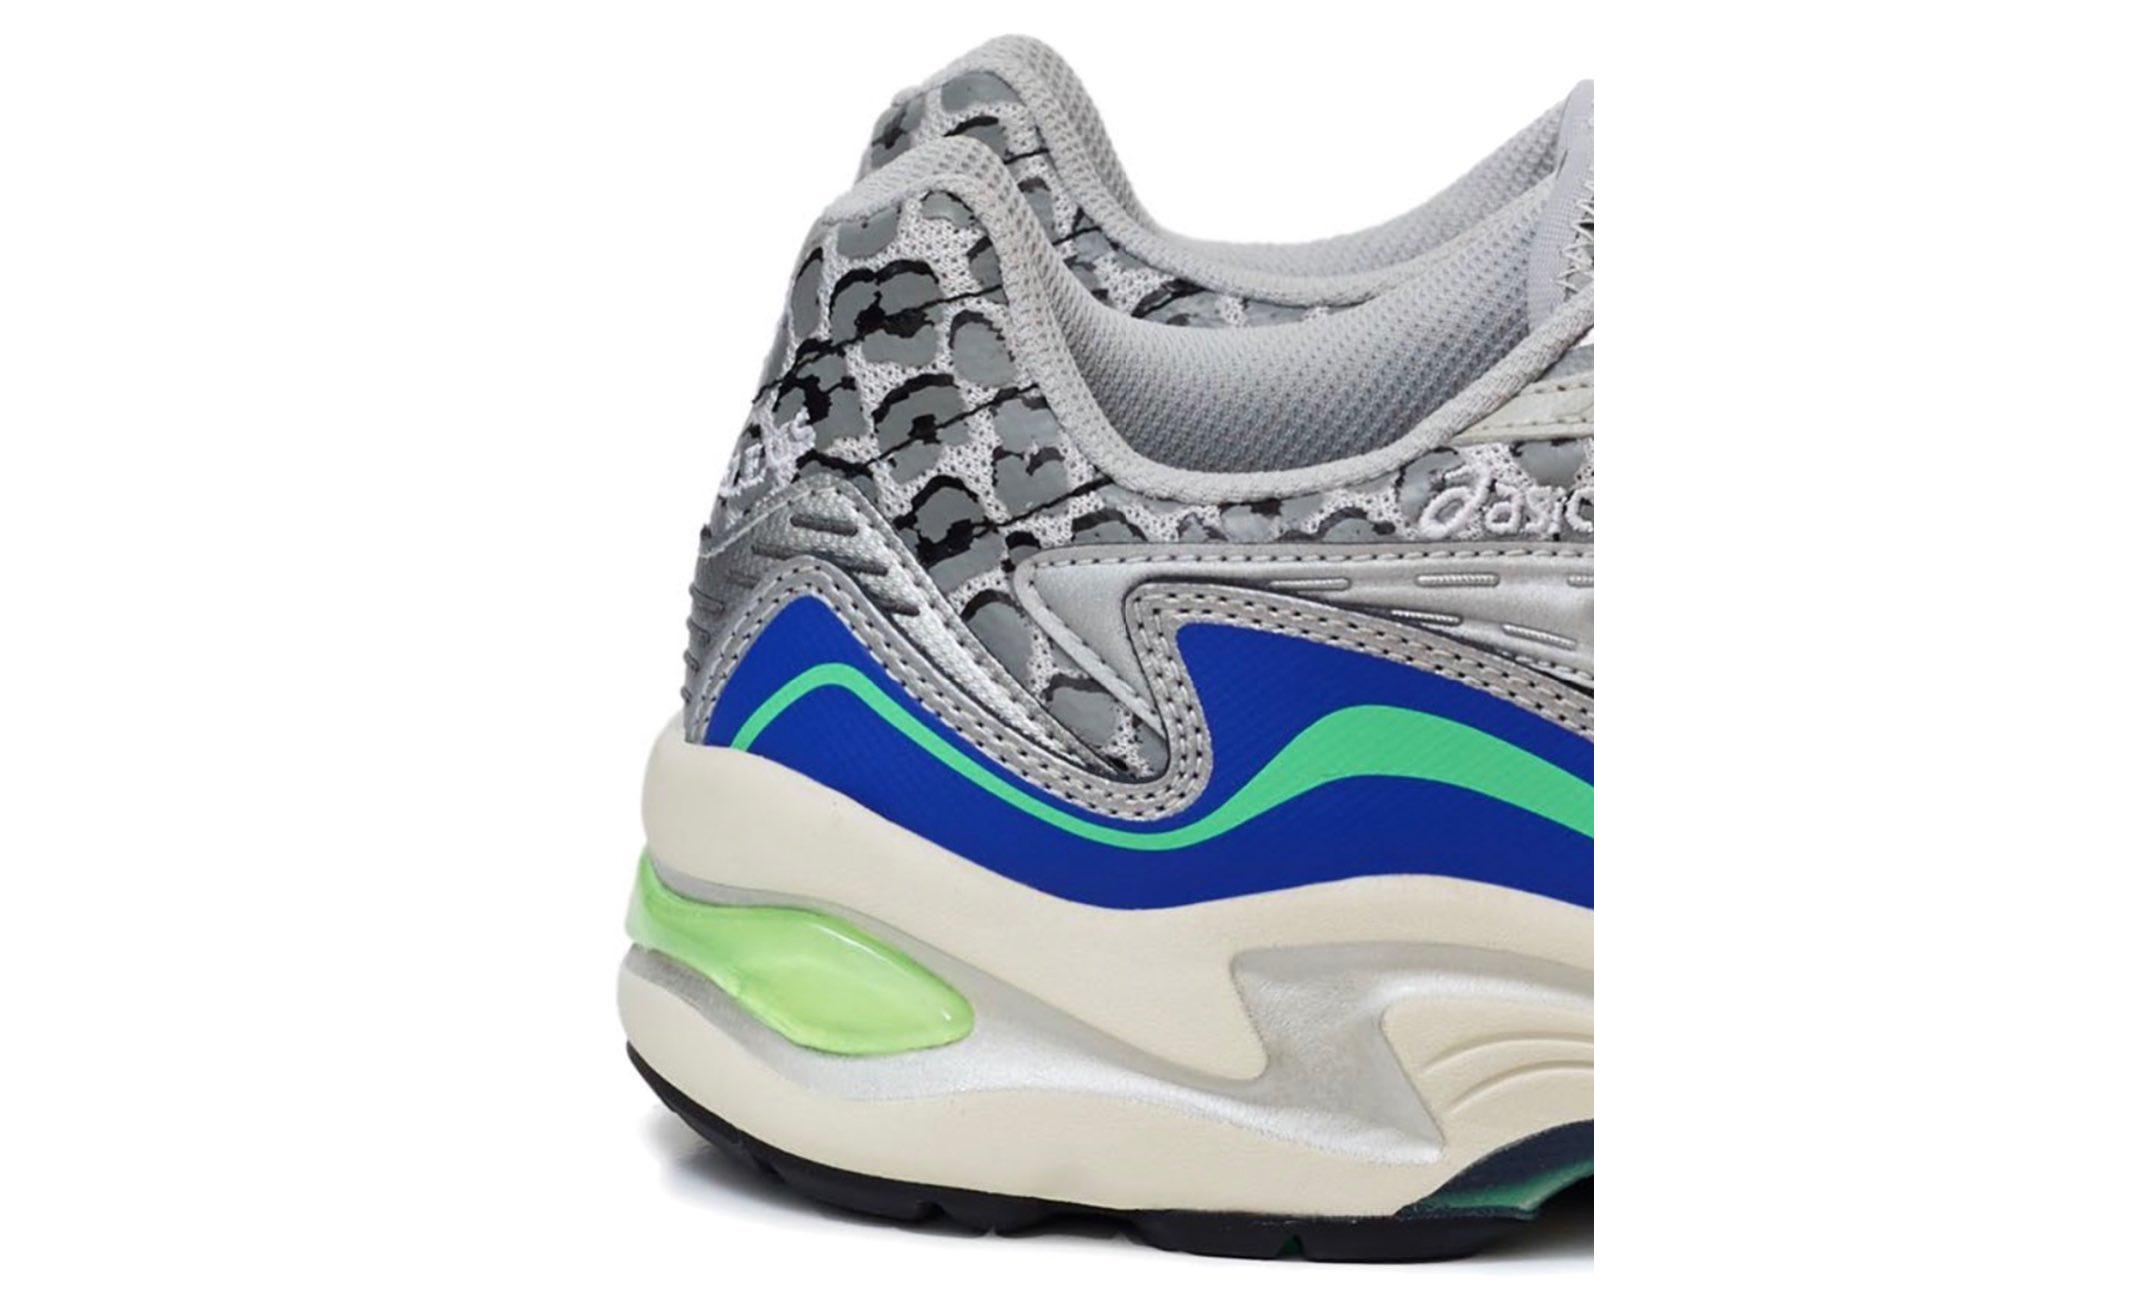 Awake NY x ASICS 新联名鞋款释出谍照